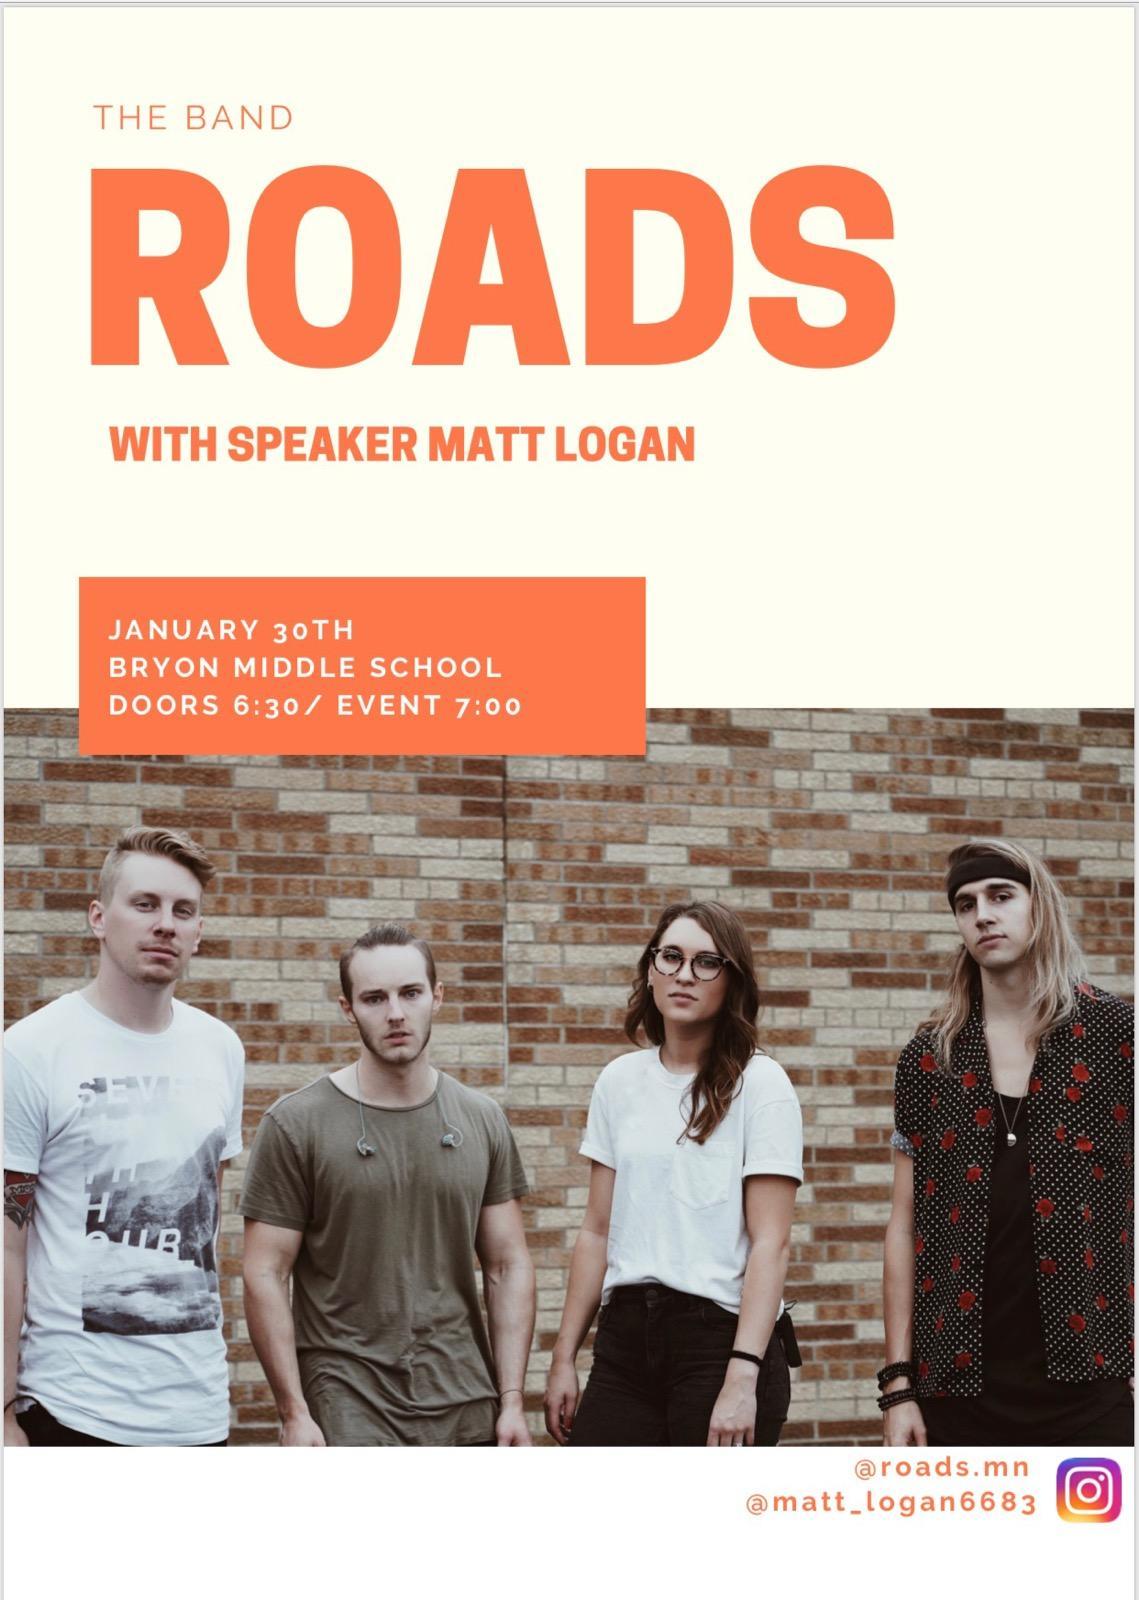 The Band Roads